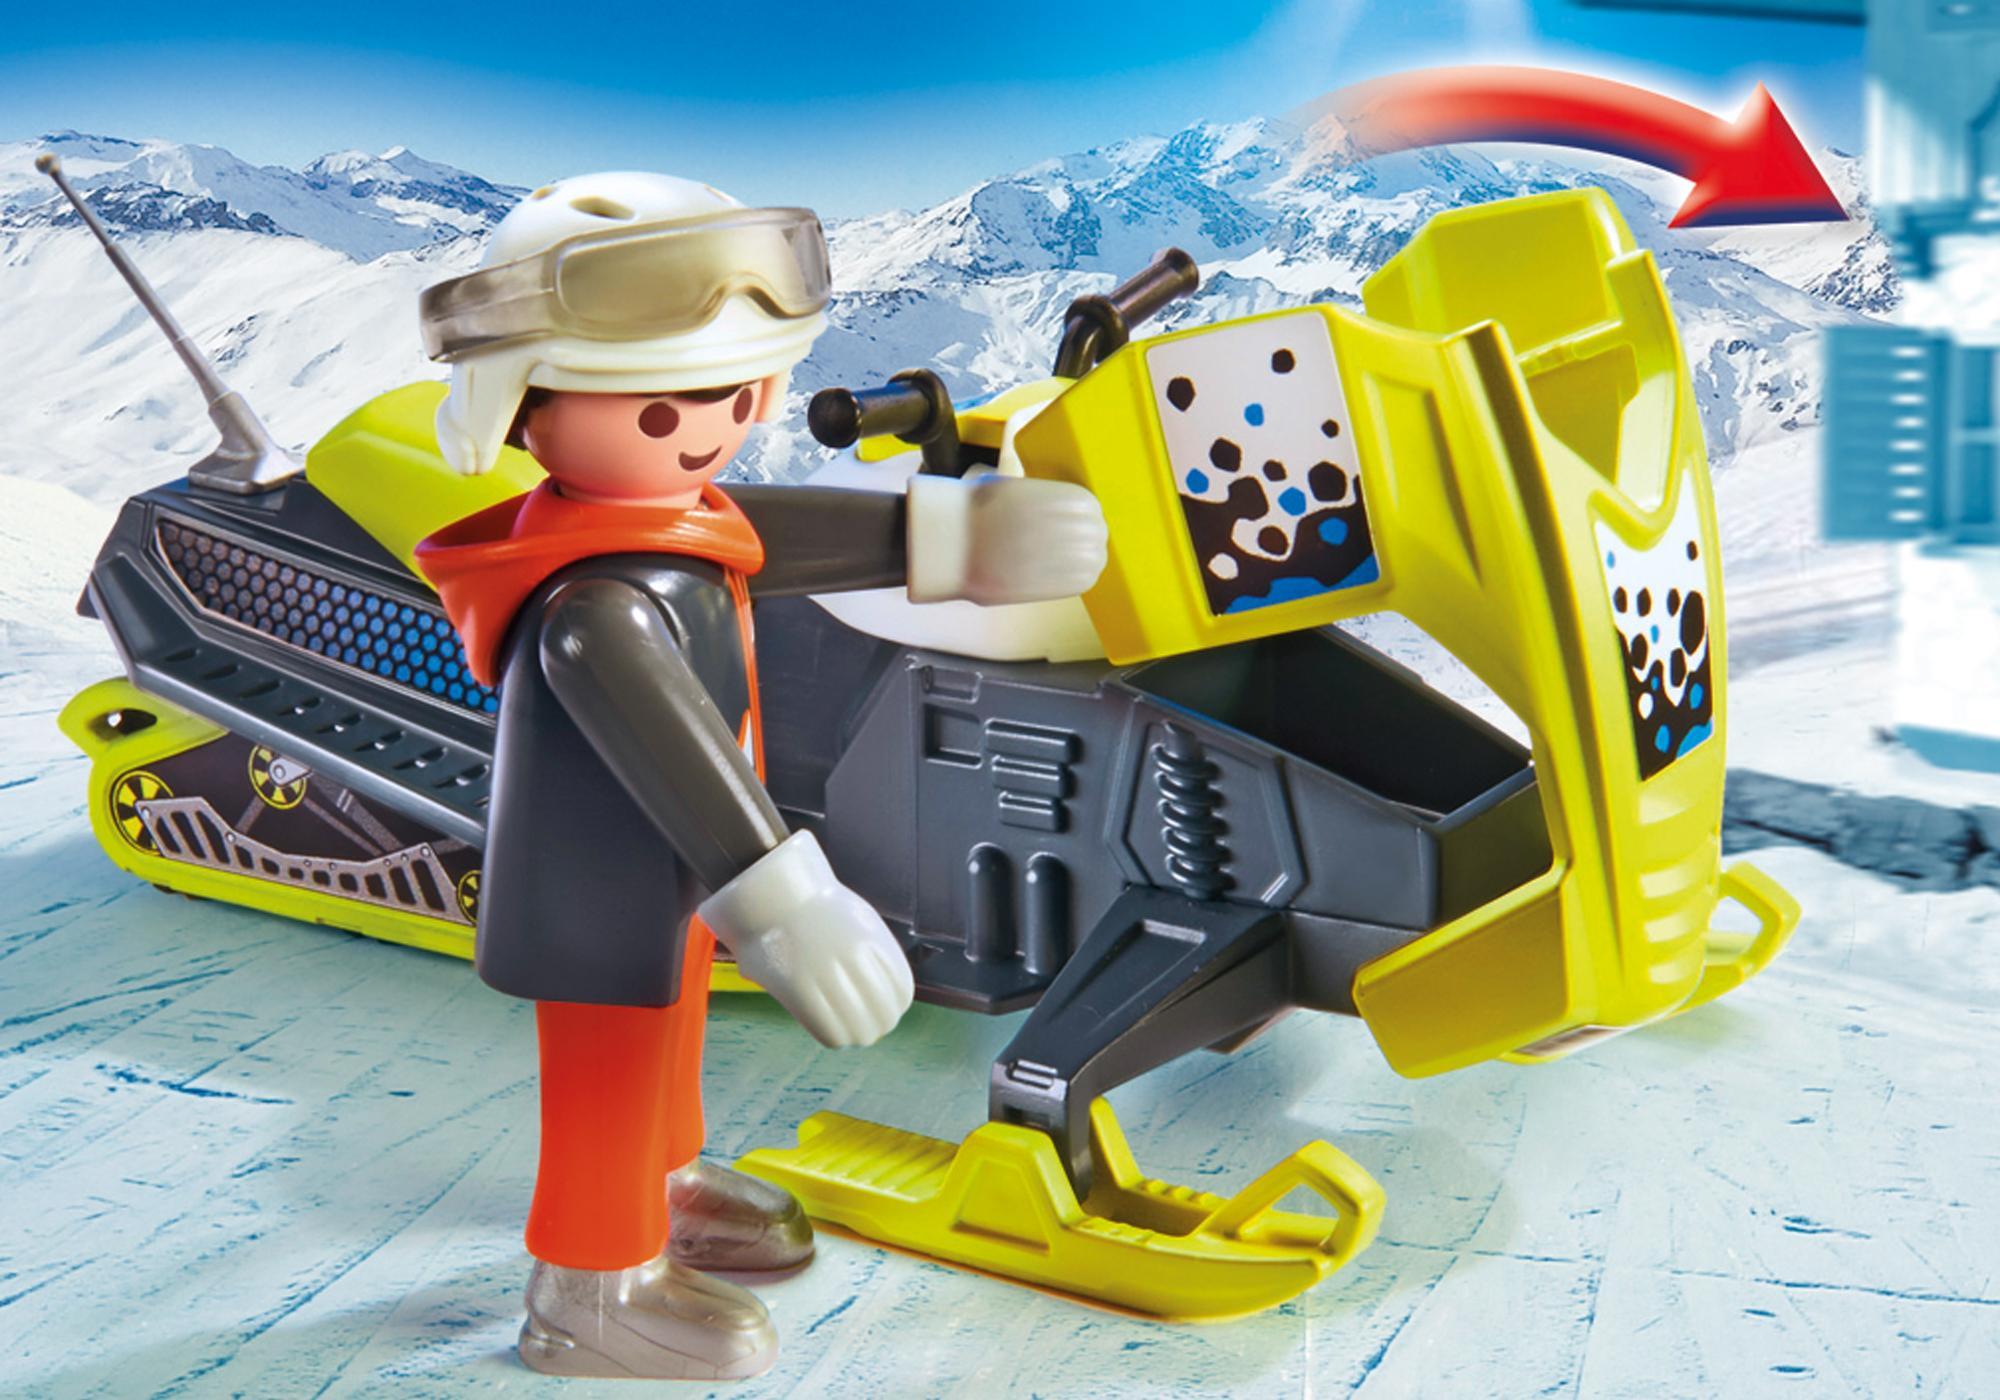 http://media.playmobil.com/i/playmobil/9285_product_extra1/Snowmobile